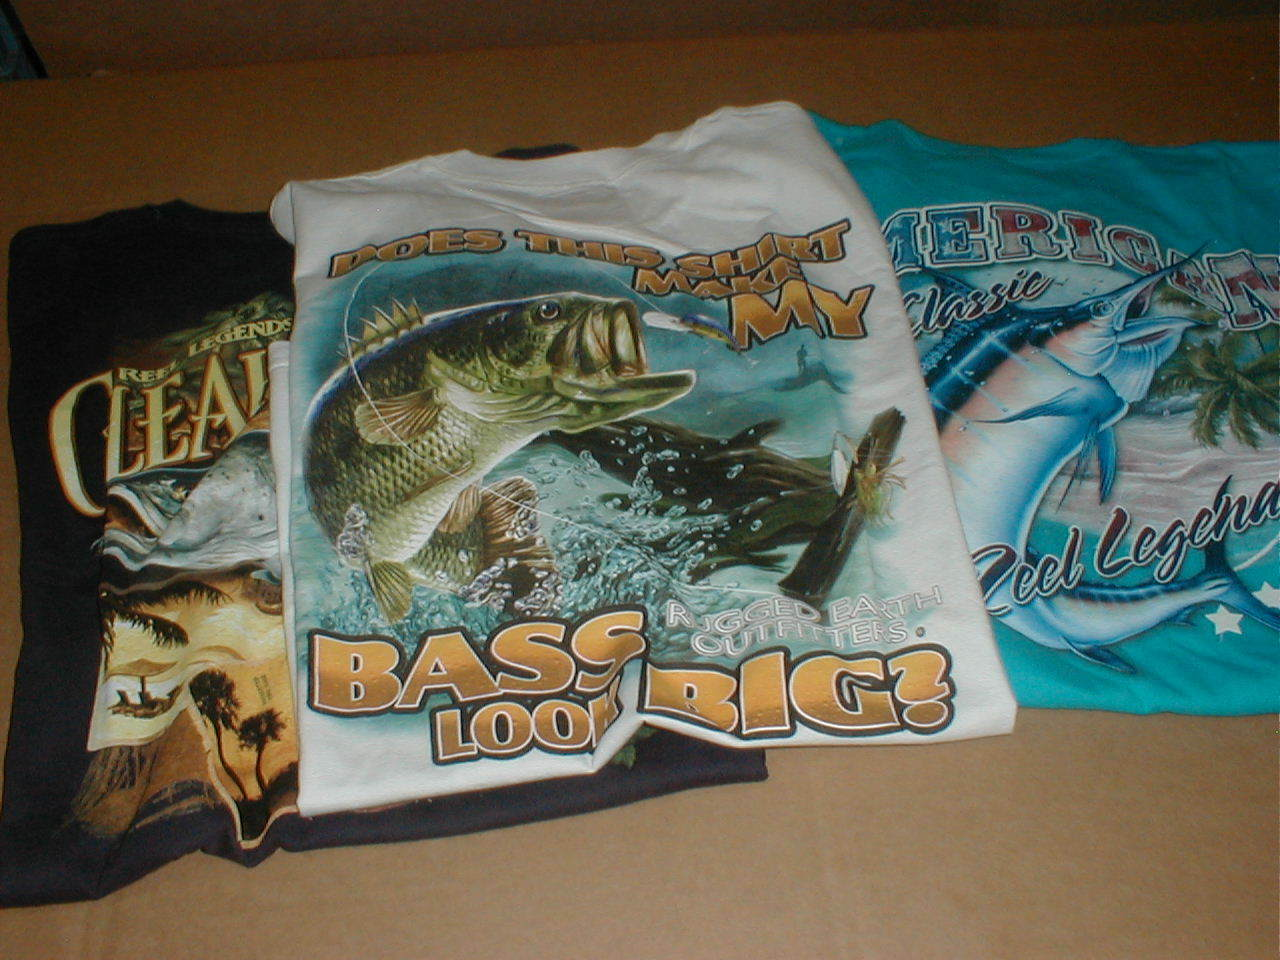 3 Reel Legend Clearwater FL Coast XL T-shirt Fishing NEW short sleeve NOS